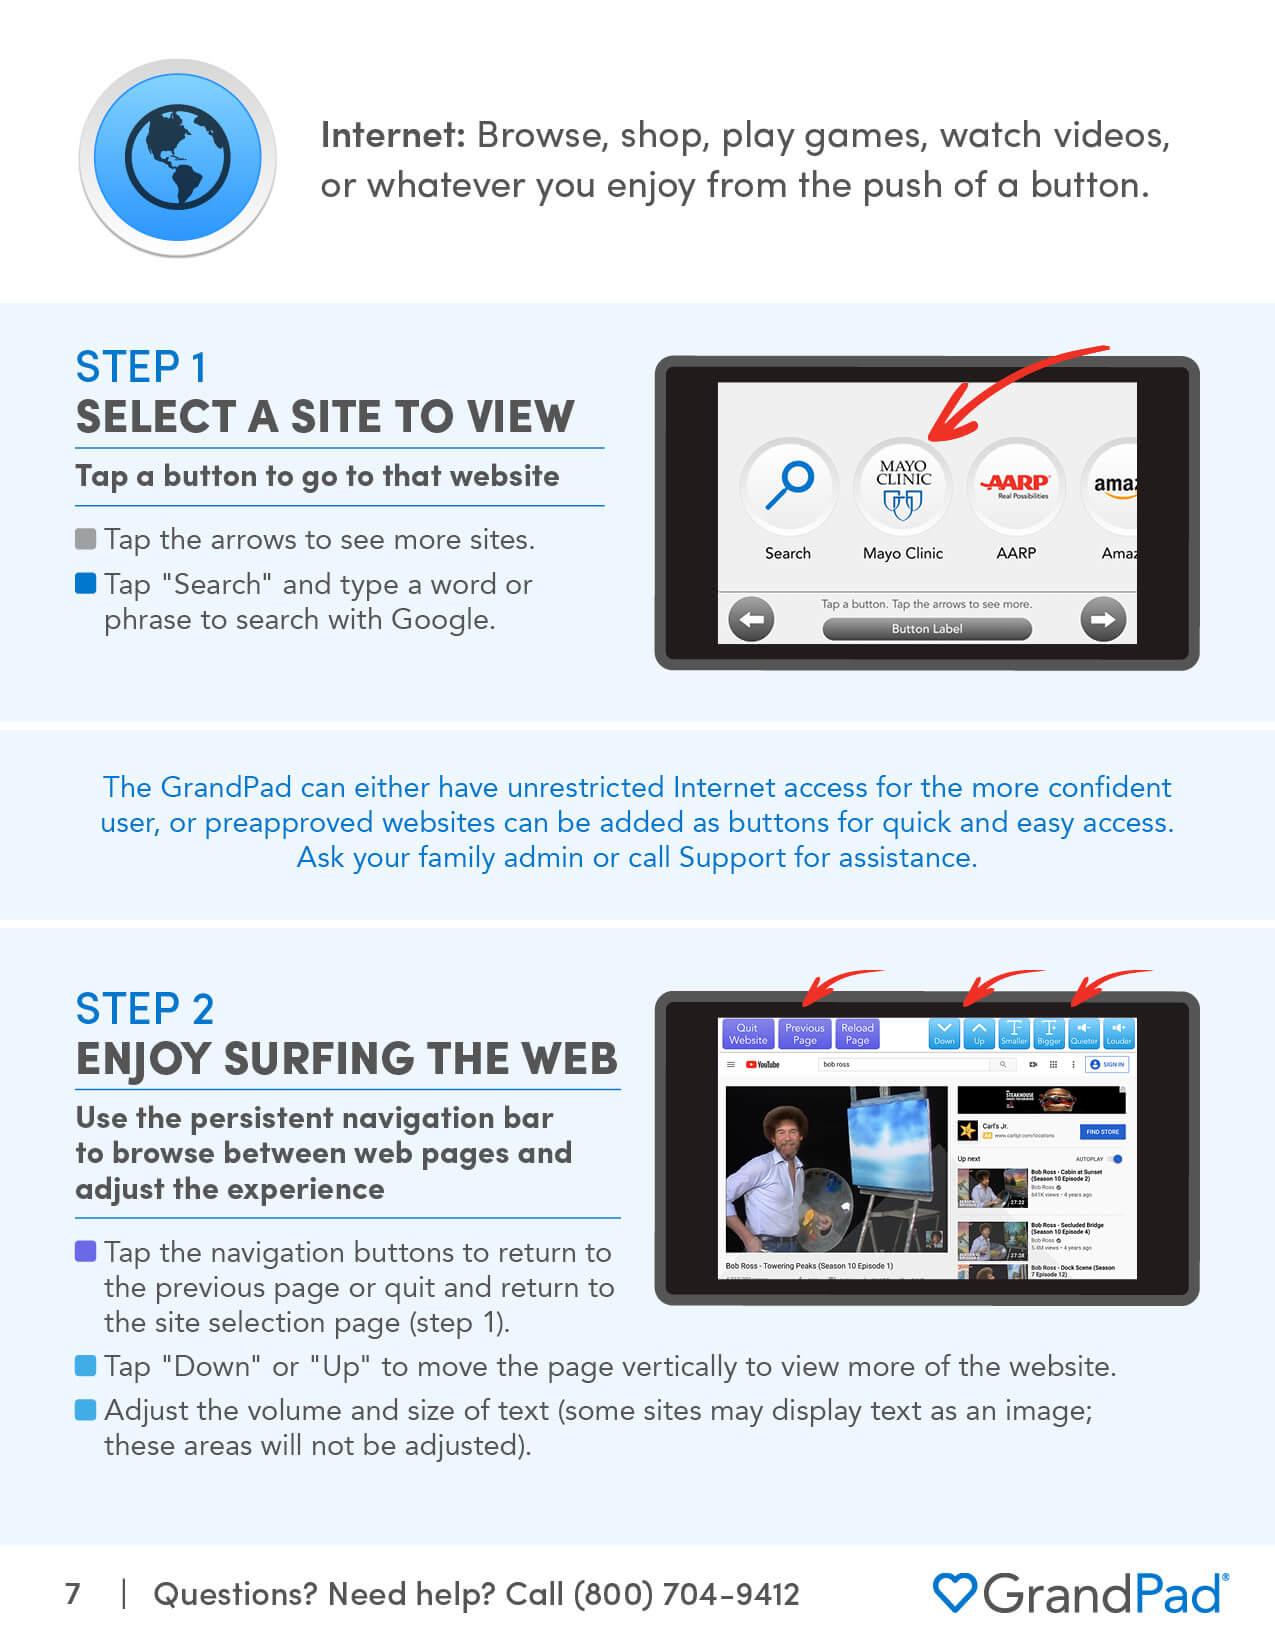 Instruction on using the Internet app